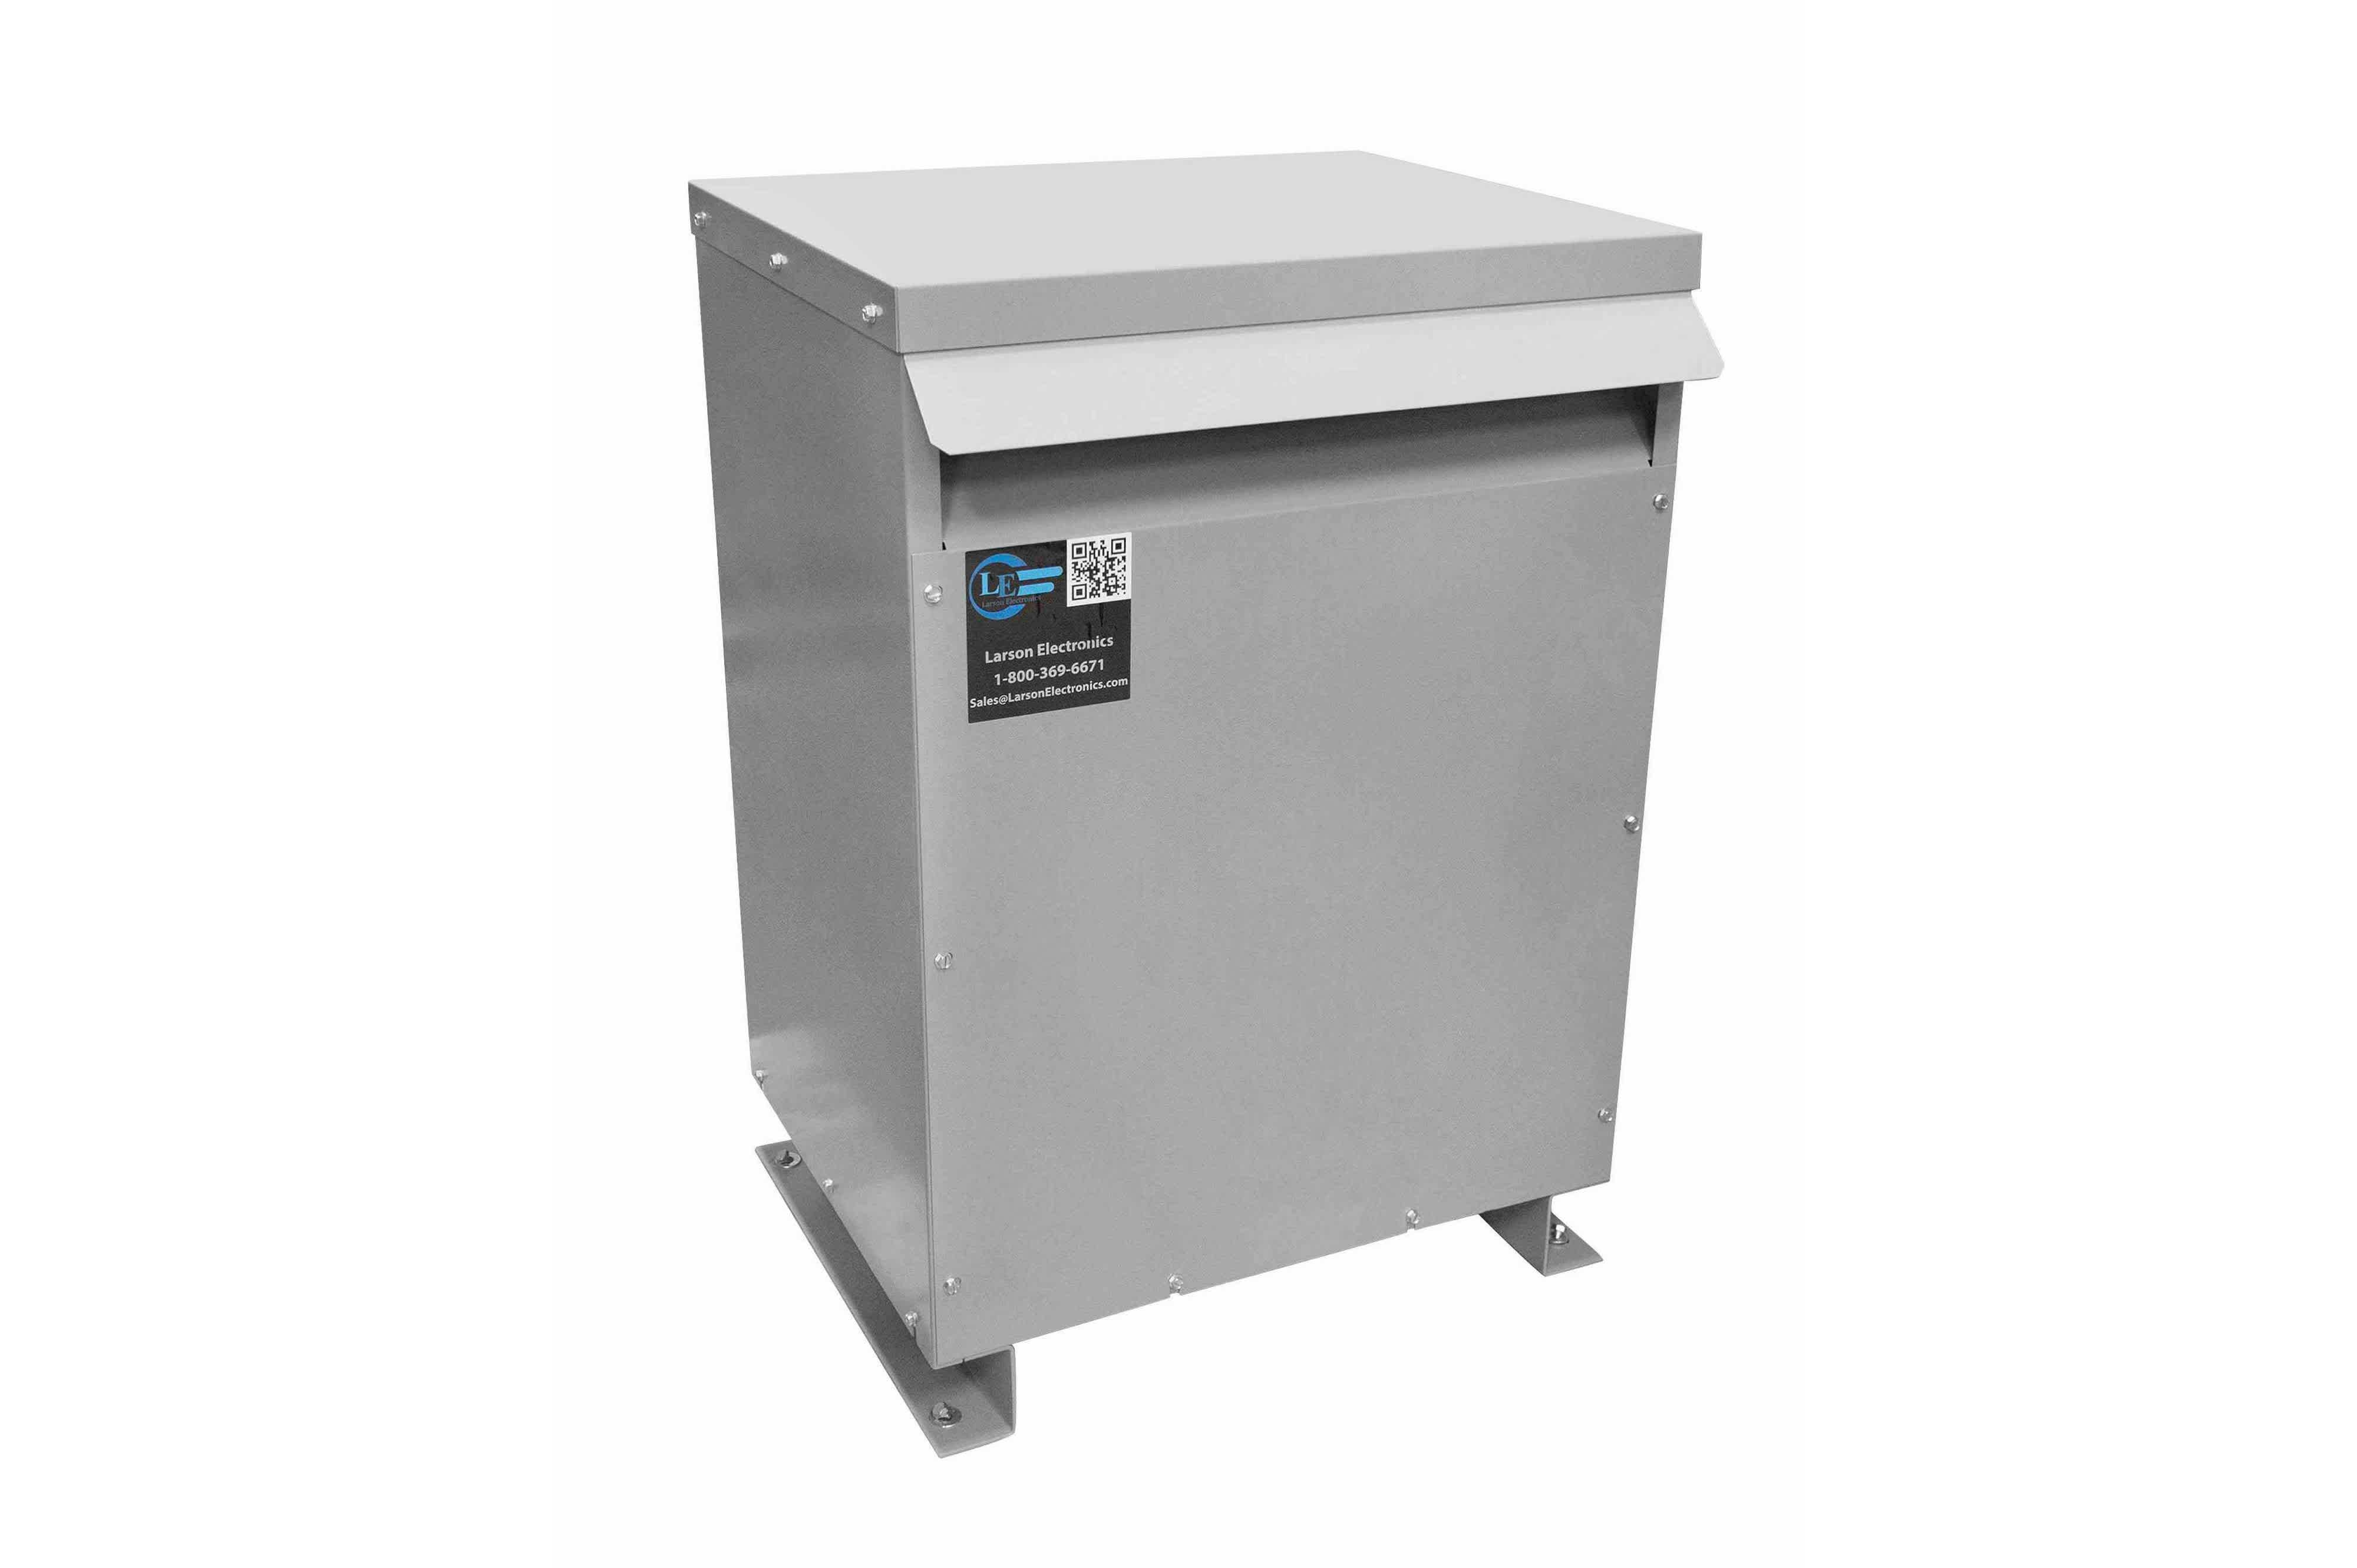 167 kVA 3PH Isolation Transformer, 575V Wye Primary, 400V Delta Secondary, N3R, Ventilated, 60 Hz